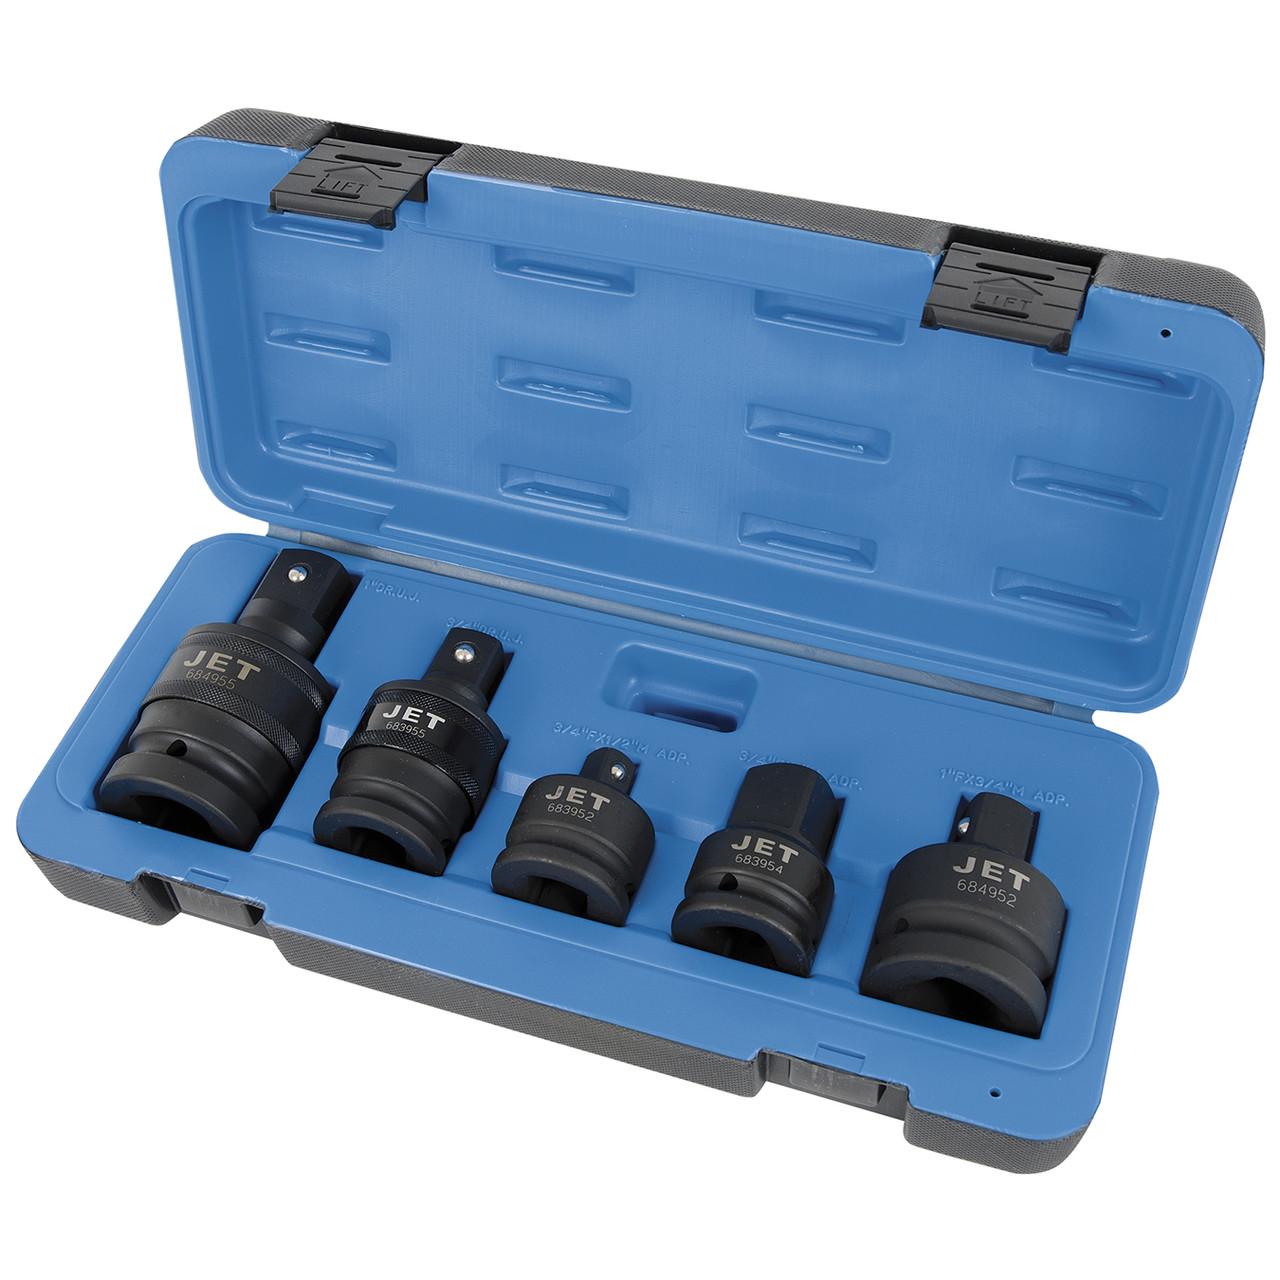 Jet 610903 7-Piece Impact Socket Accessory Kit